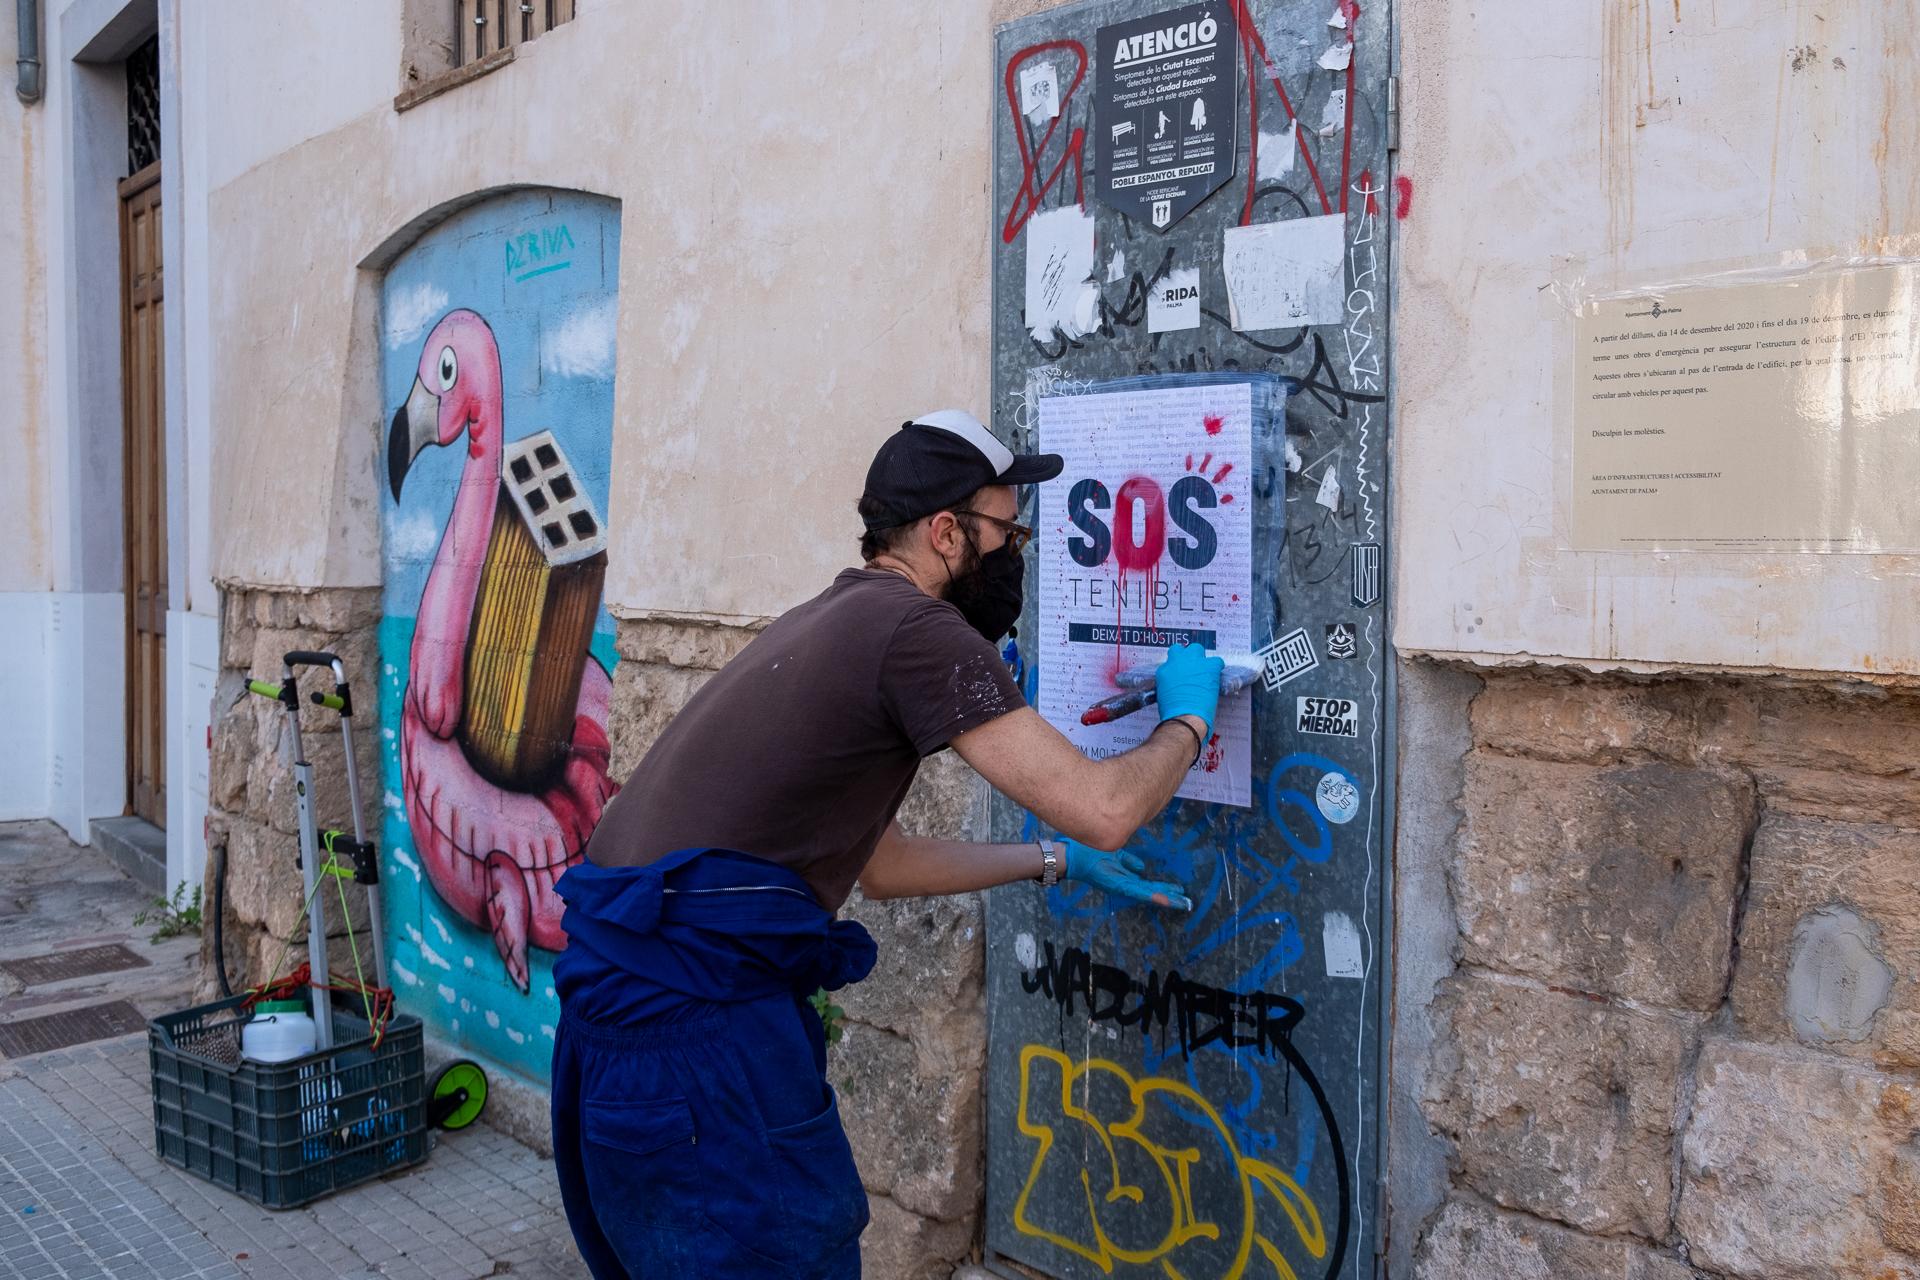 Abraham Calero: SOStenible - Estilo Palma